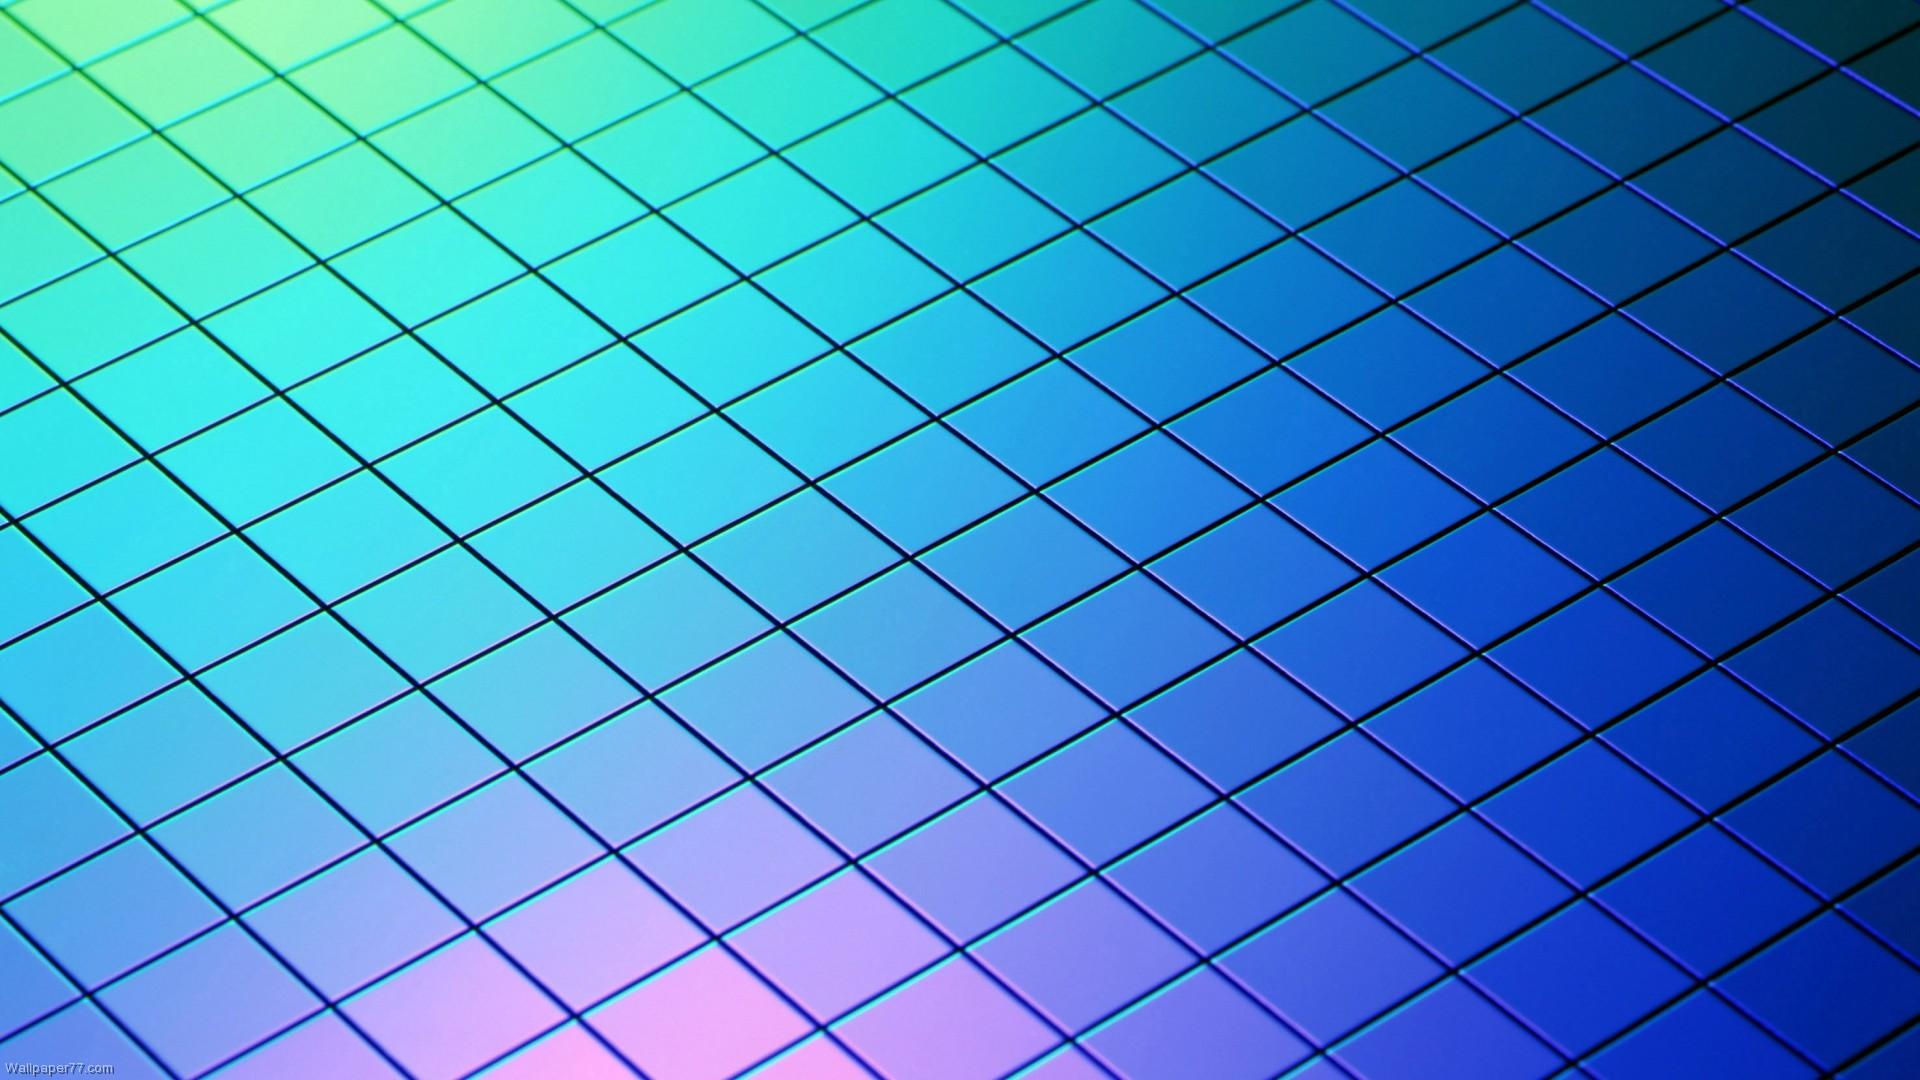 48 Pattern Background Wallpaper On Wallpapersafari